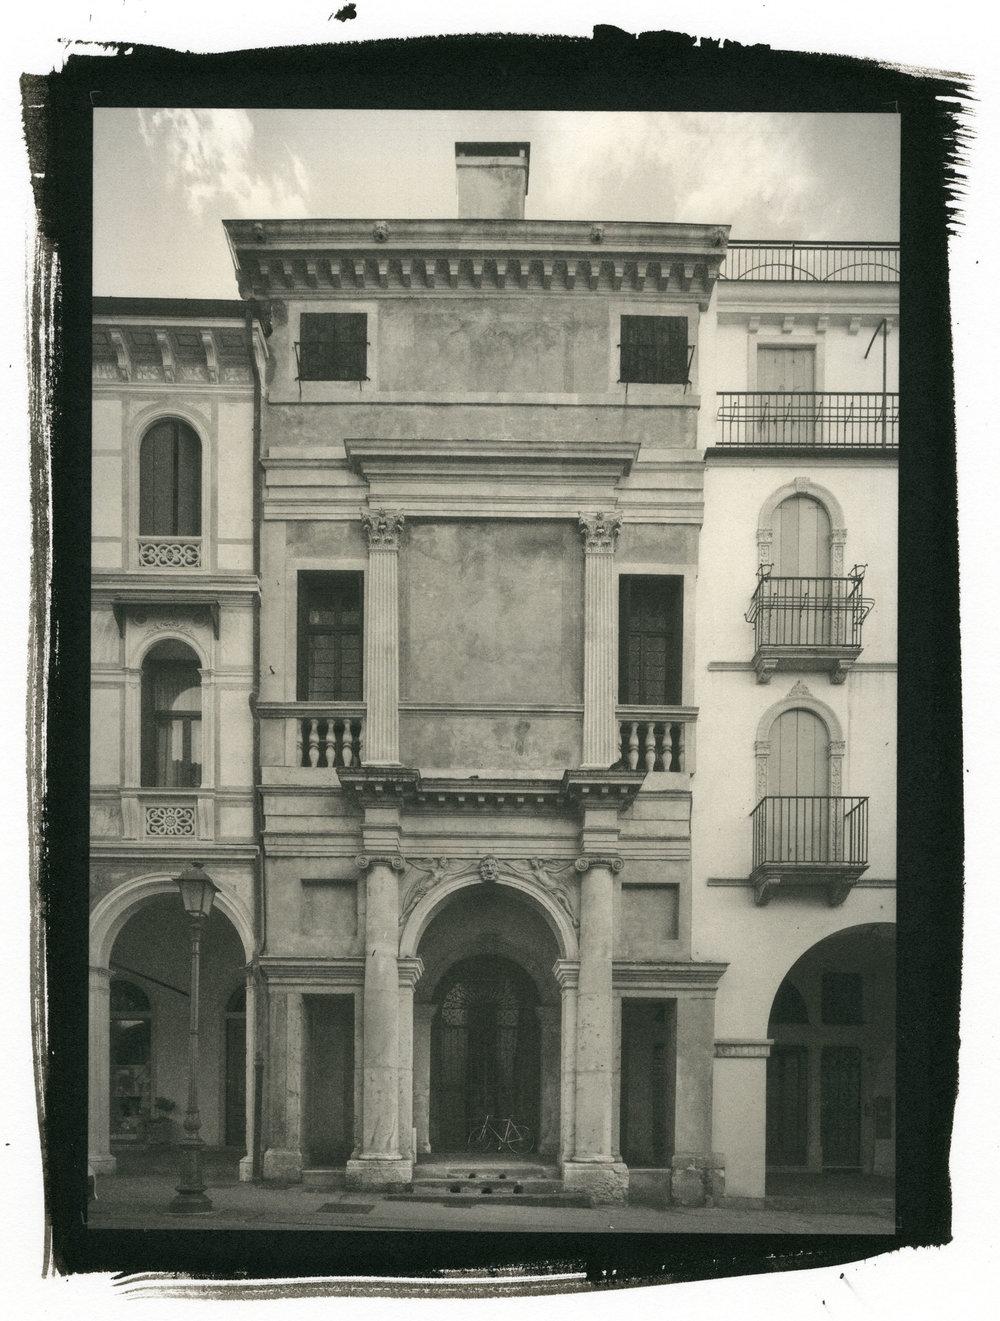 "Casa Gogollo, Vicenza Italy (Platinum/Palladium Print, 8 x 10"")"